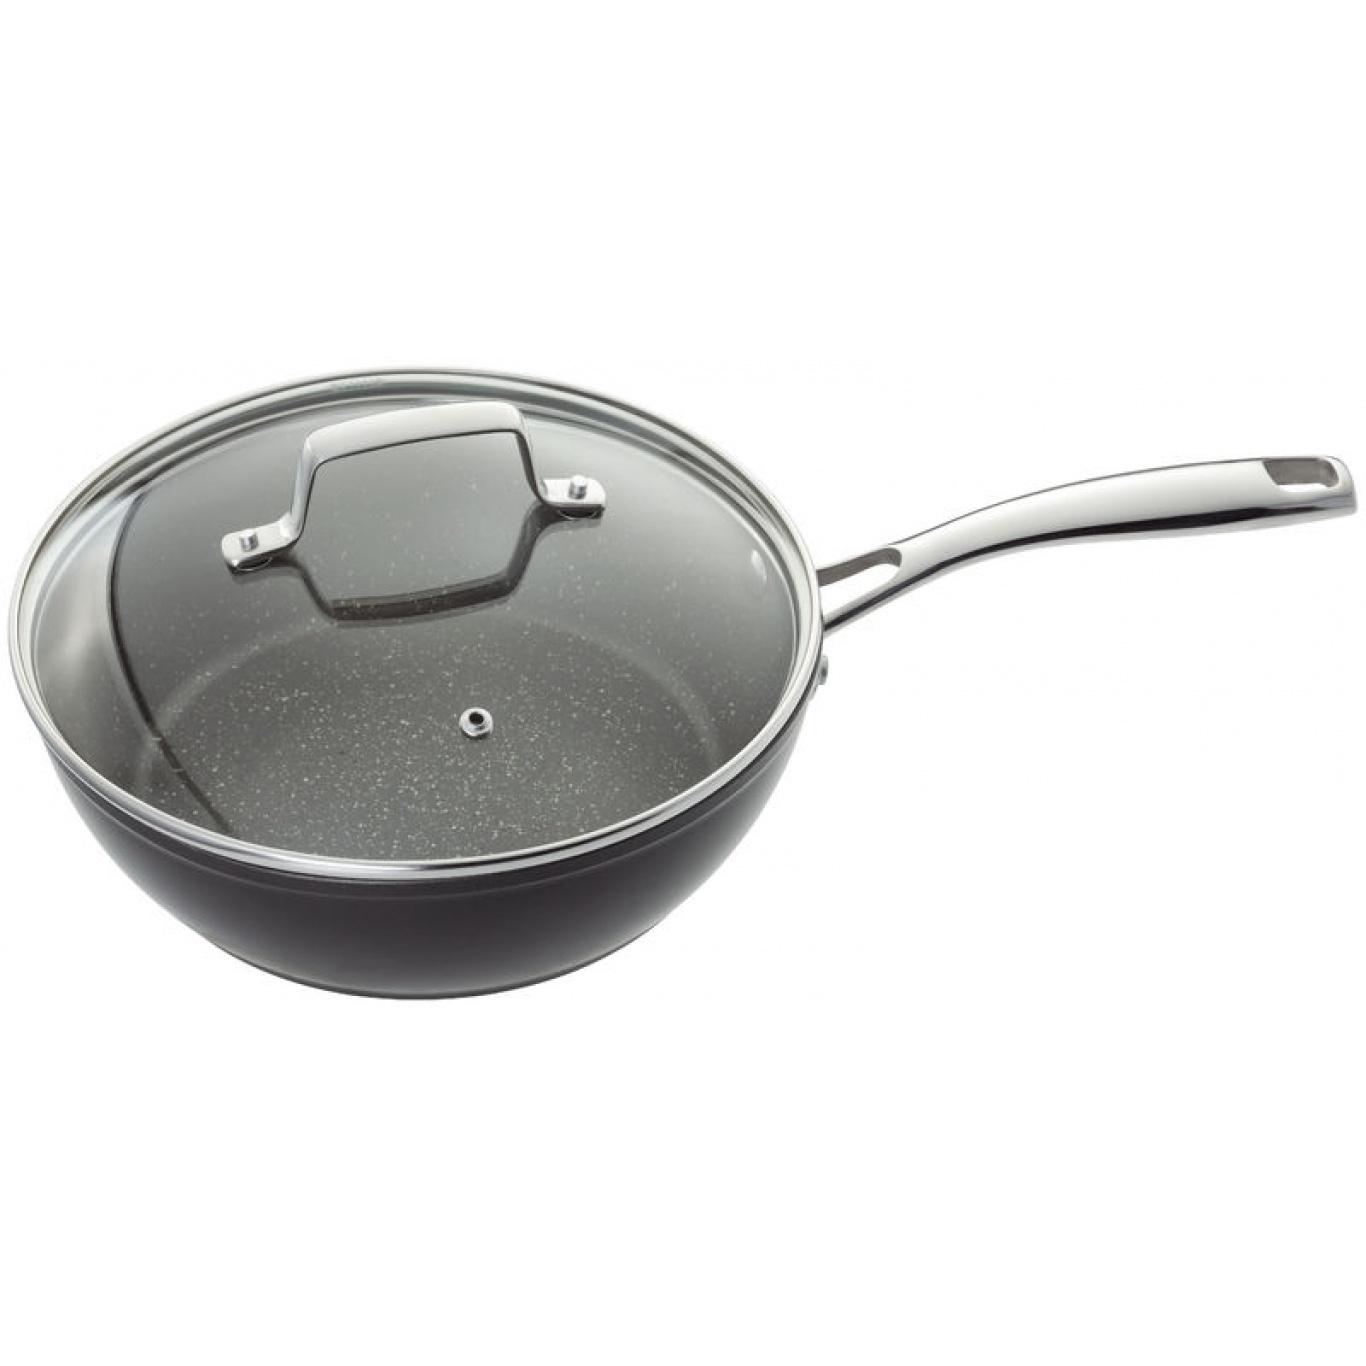 Image of Stellar Rocktanium 24cm Saute Pan